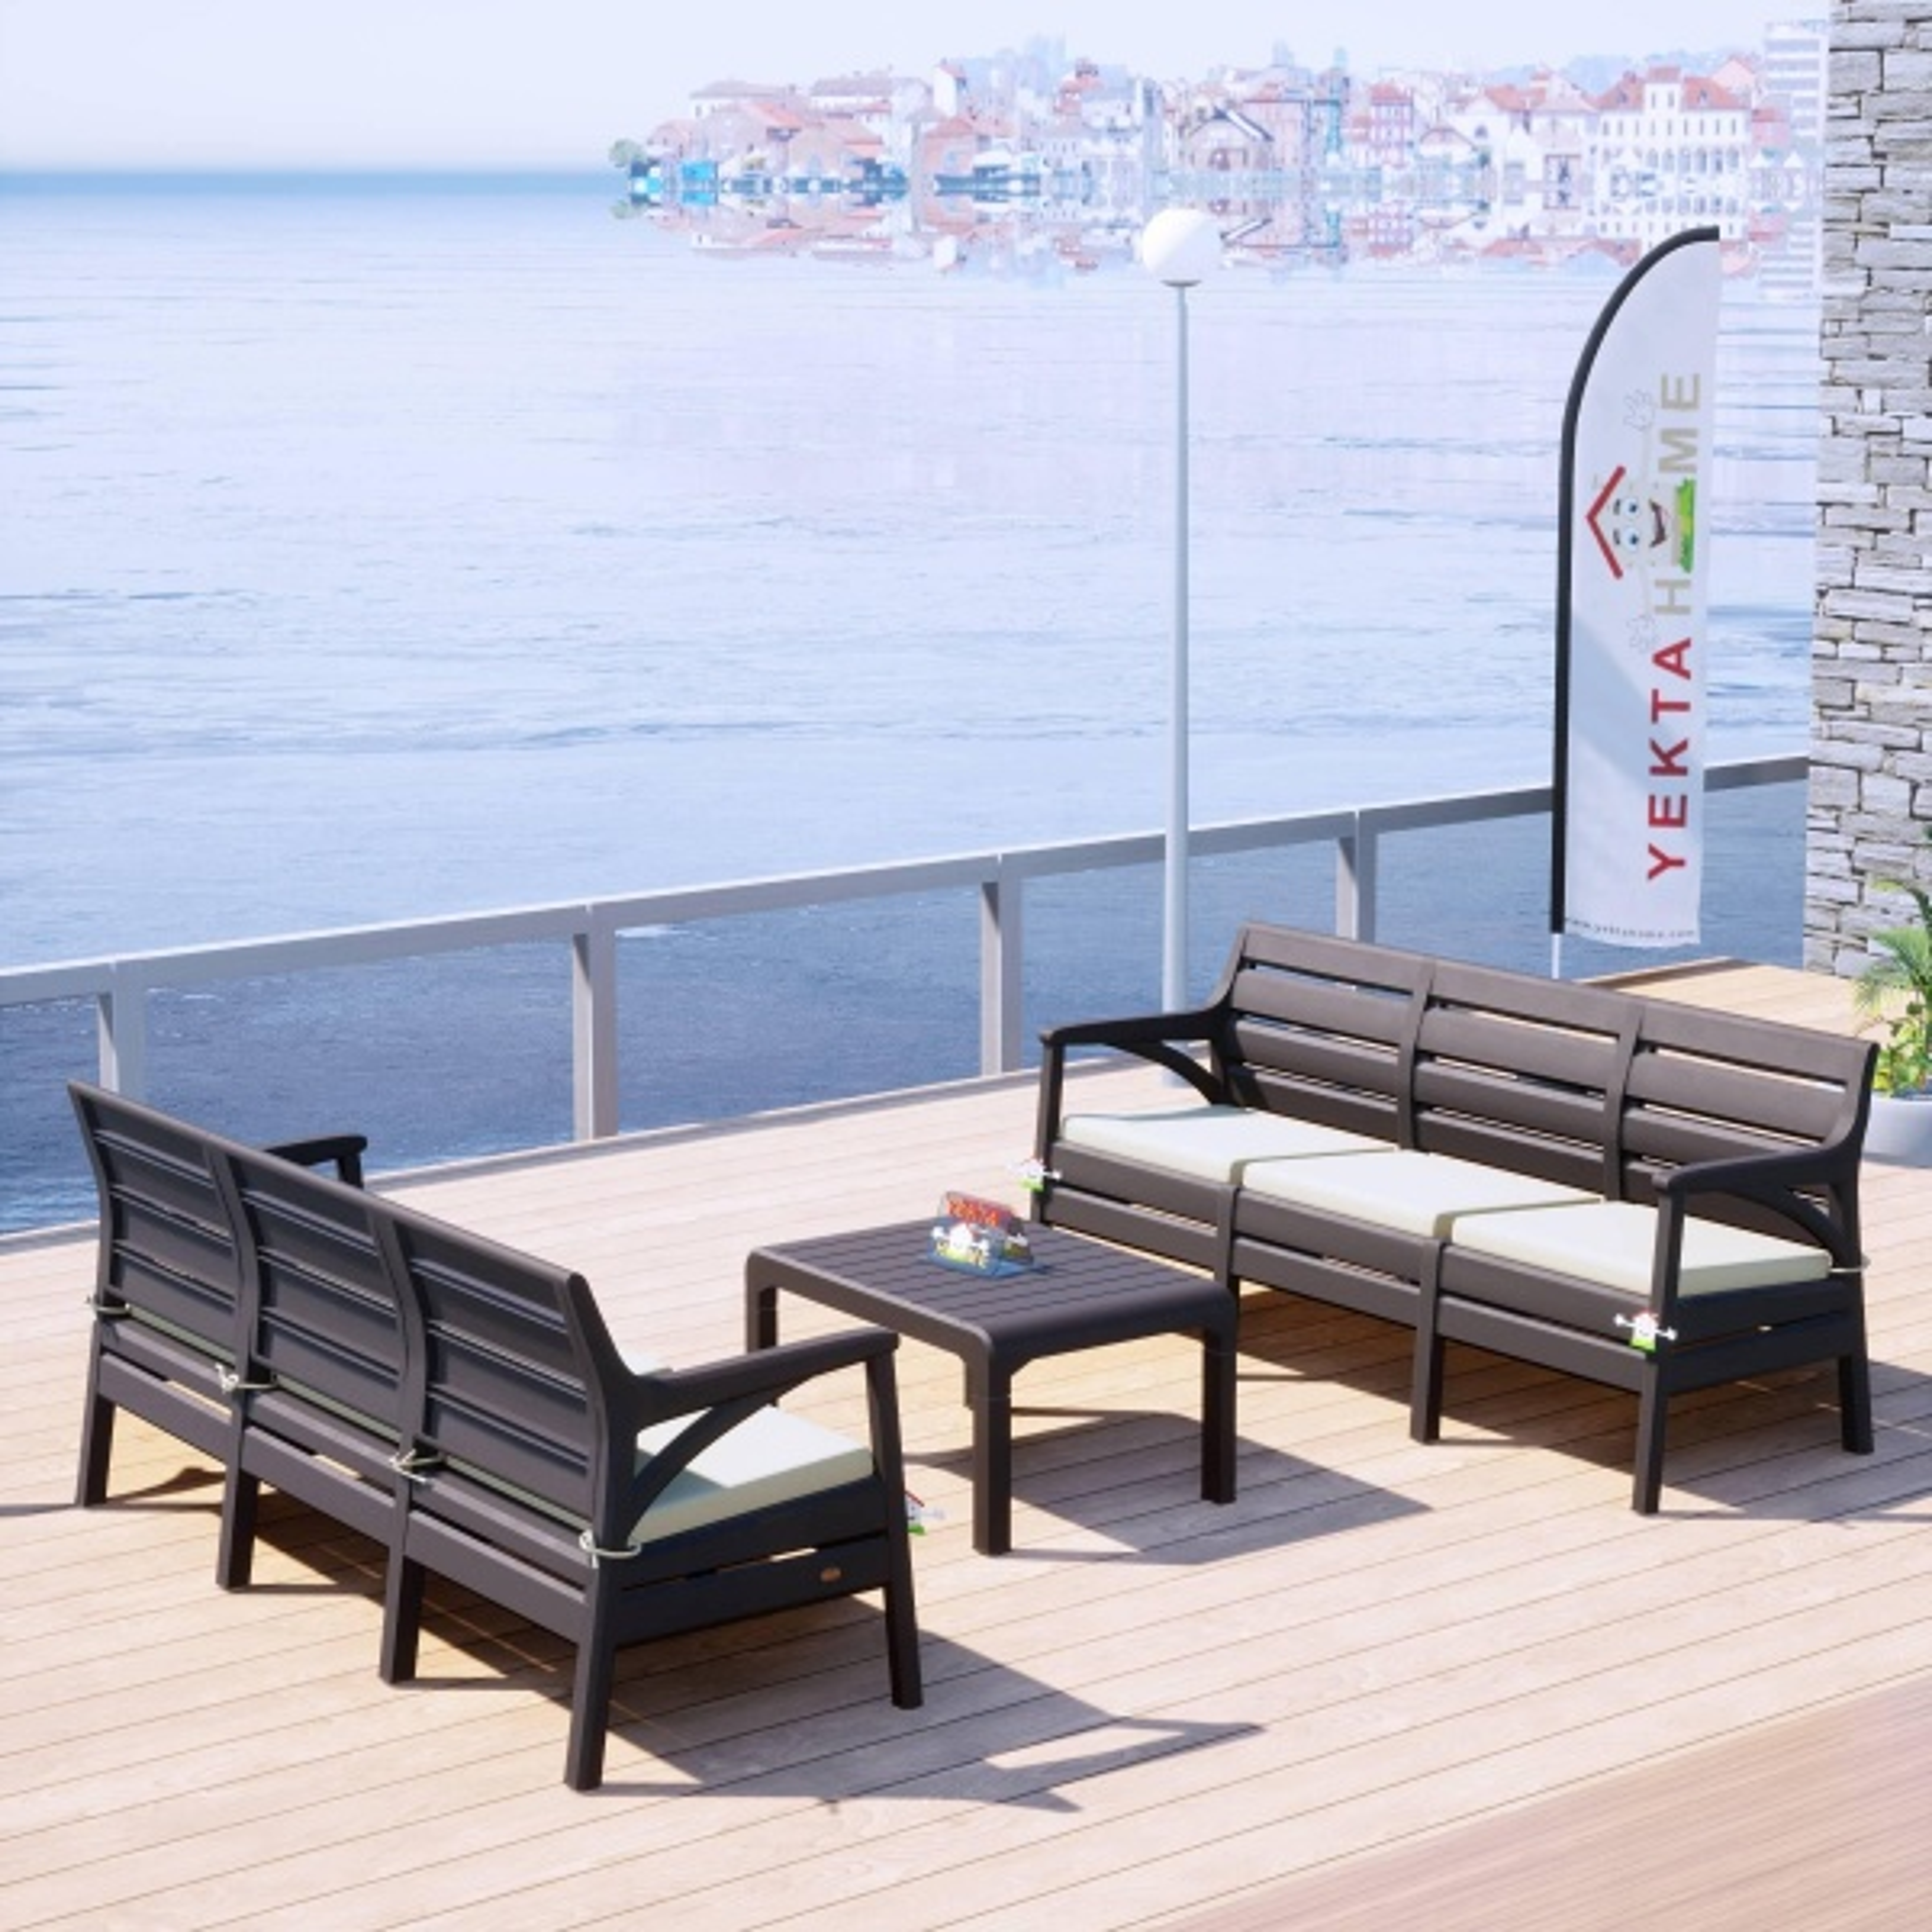 Holiday Milano Bahçe Takımı Oturma Grubu Balkon Seti Kahverengi